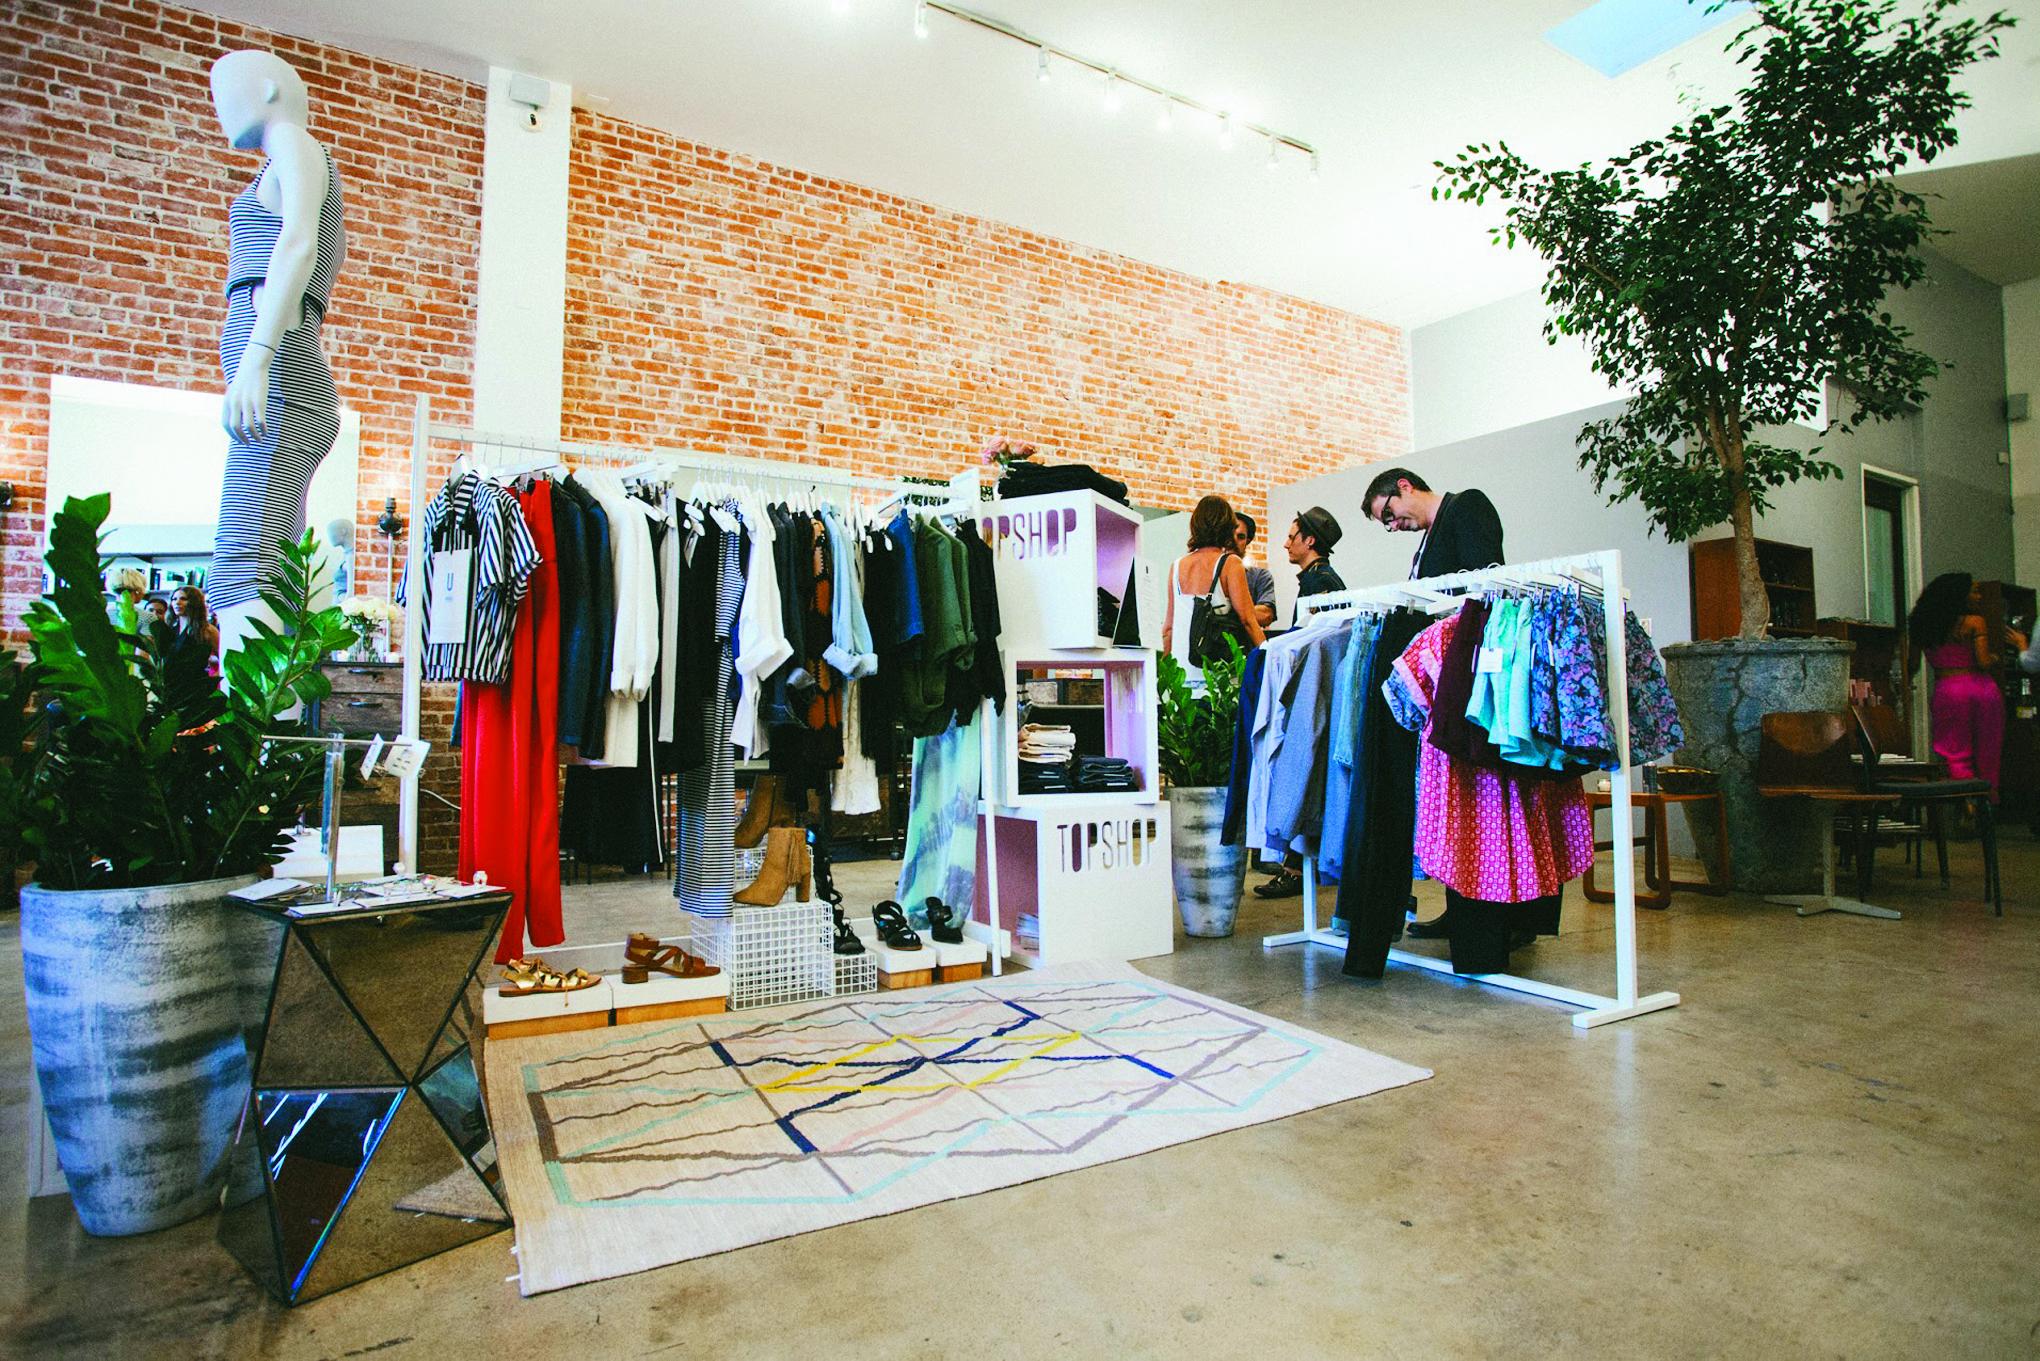 The Pop-up Shop at Harper's Salon